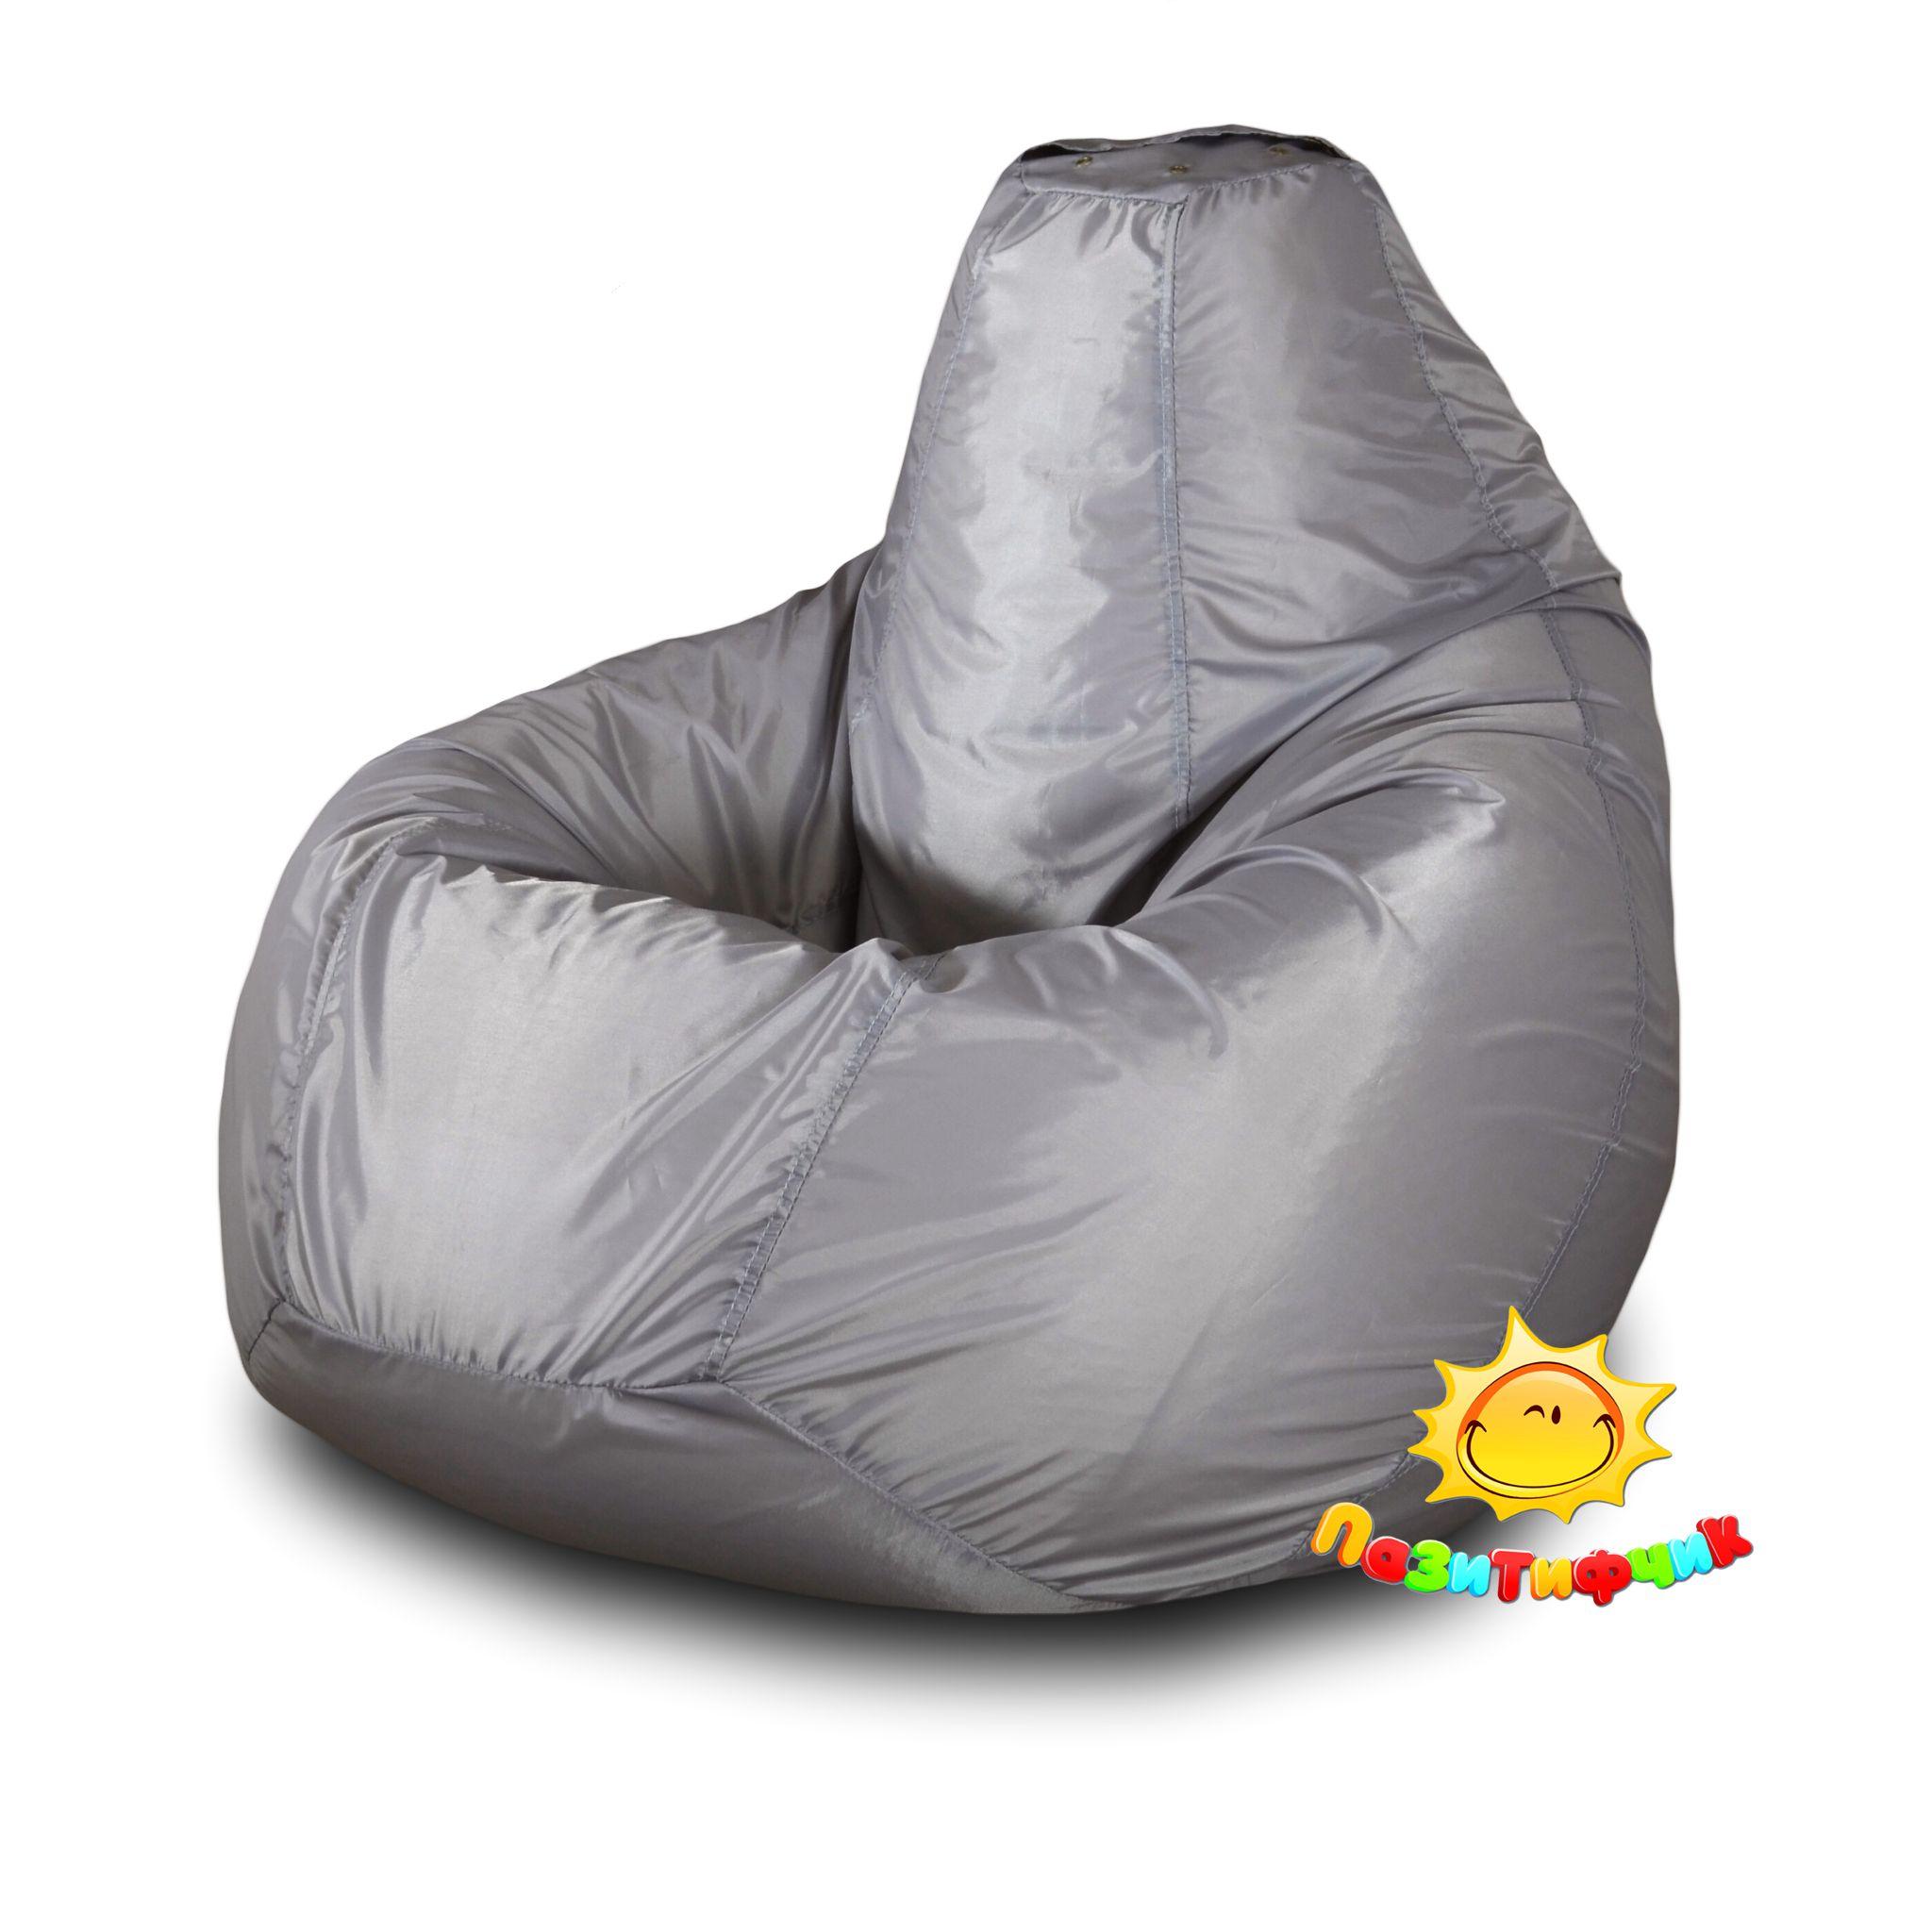 Кресло-мешок Pazitif Груша Пазитифчик Оксфорд, размер XL, оксфорд, серый фото